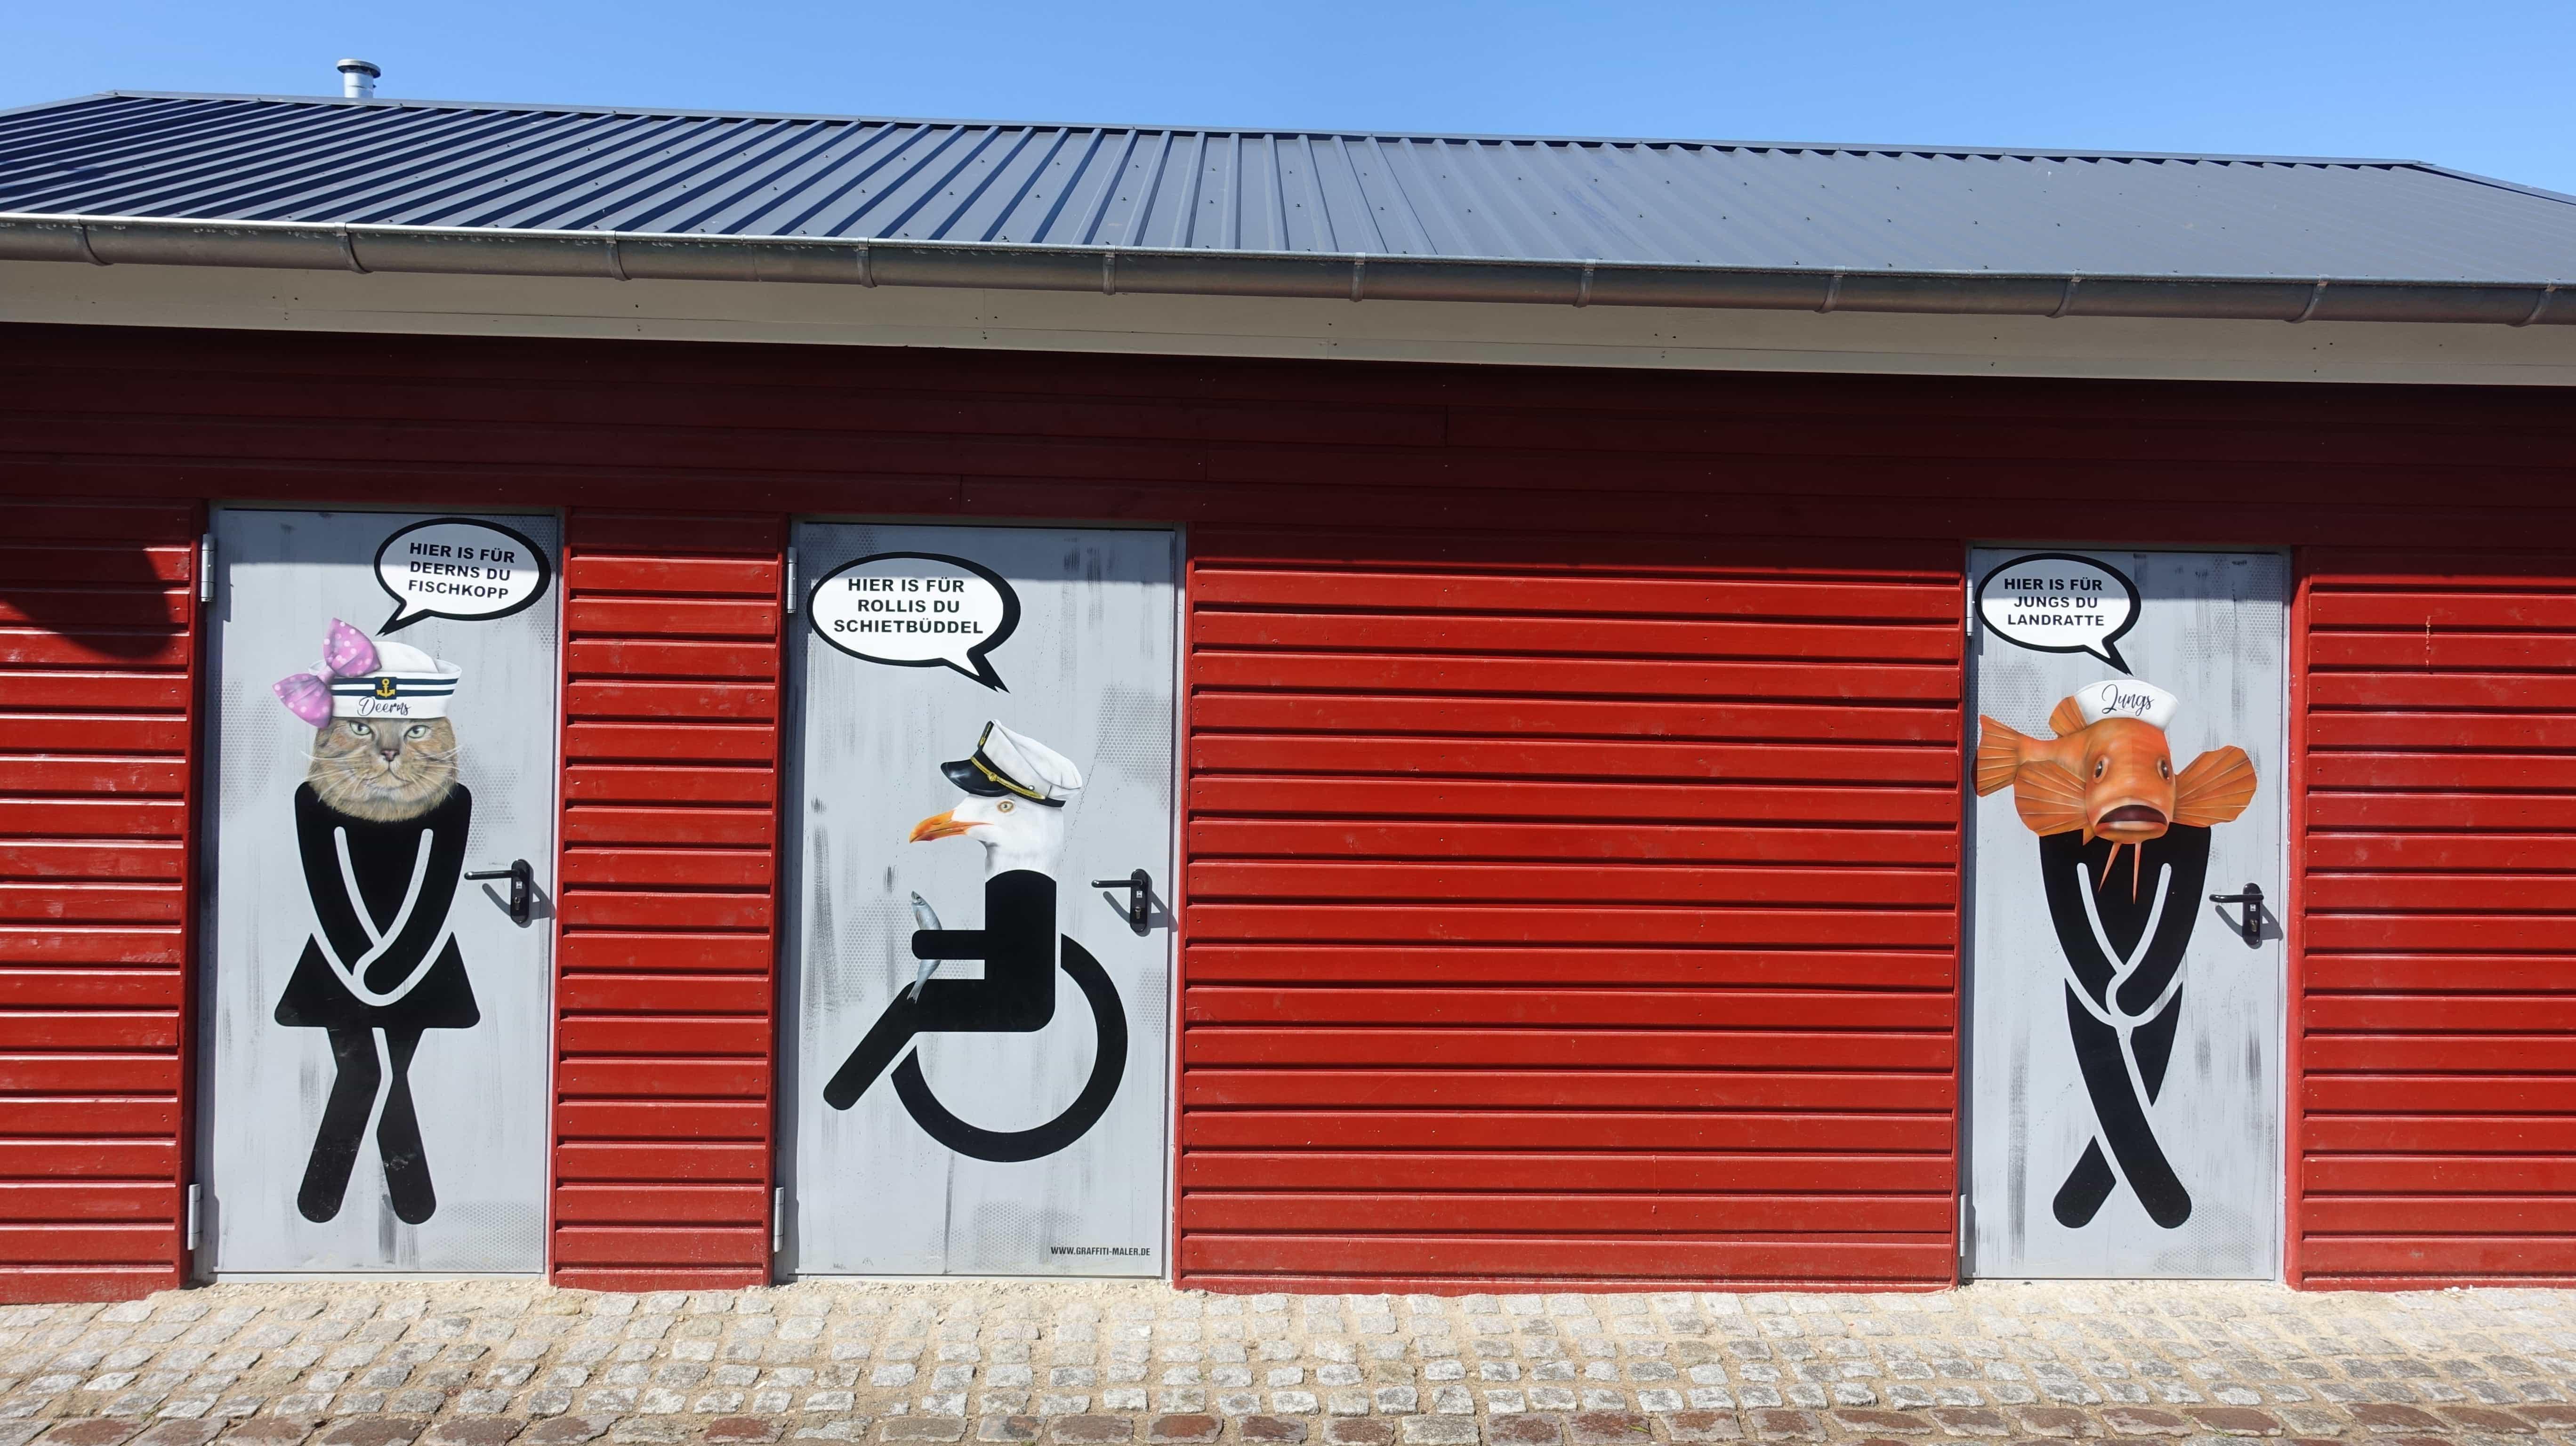 Öffentliche Toiletten am Kapitänsweg in Flensburg